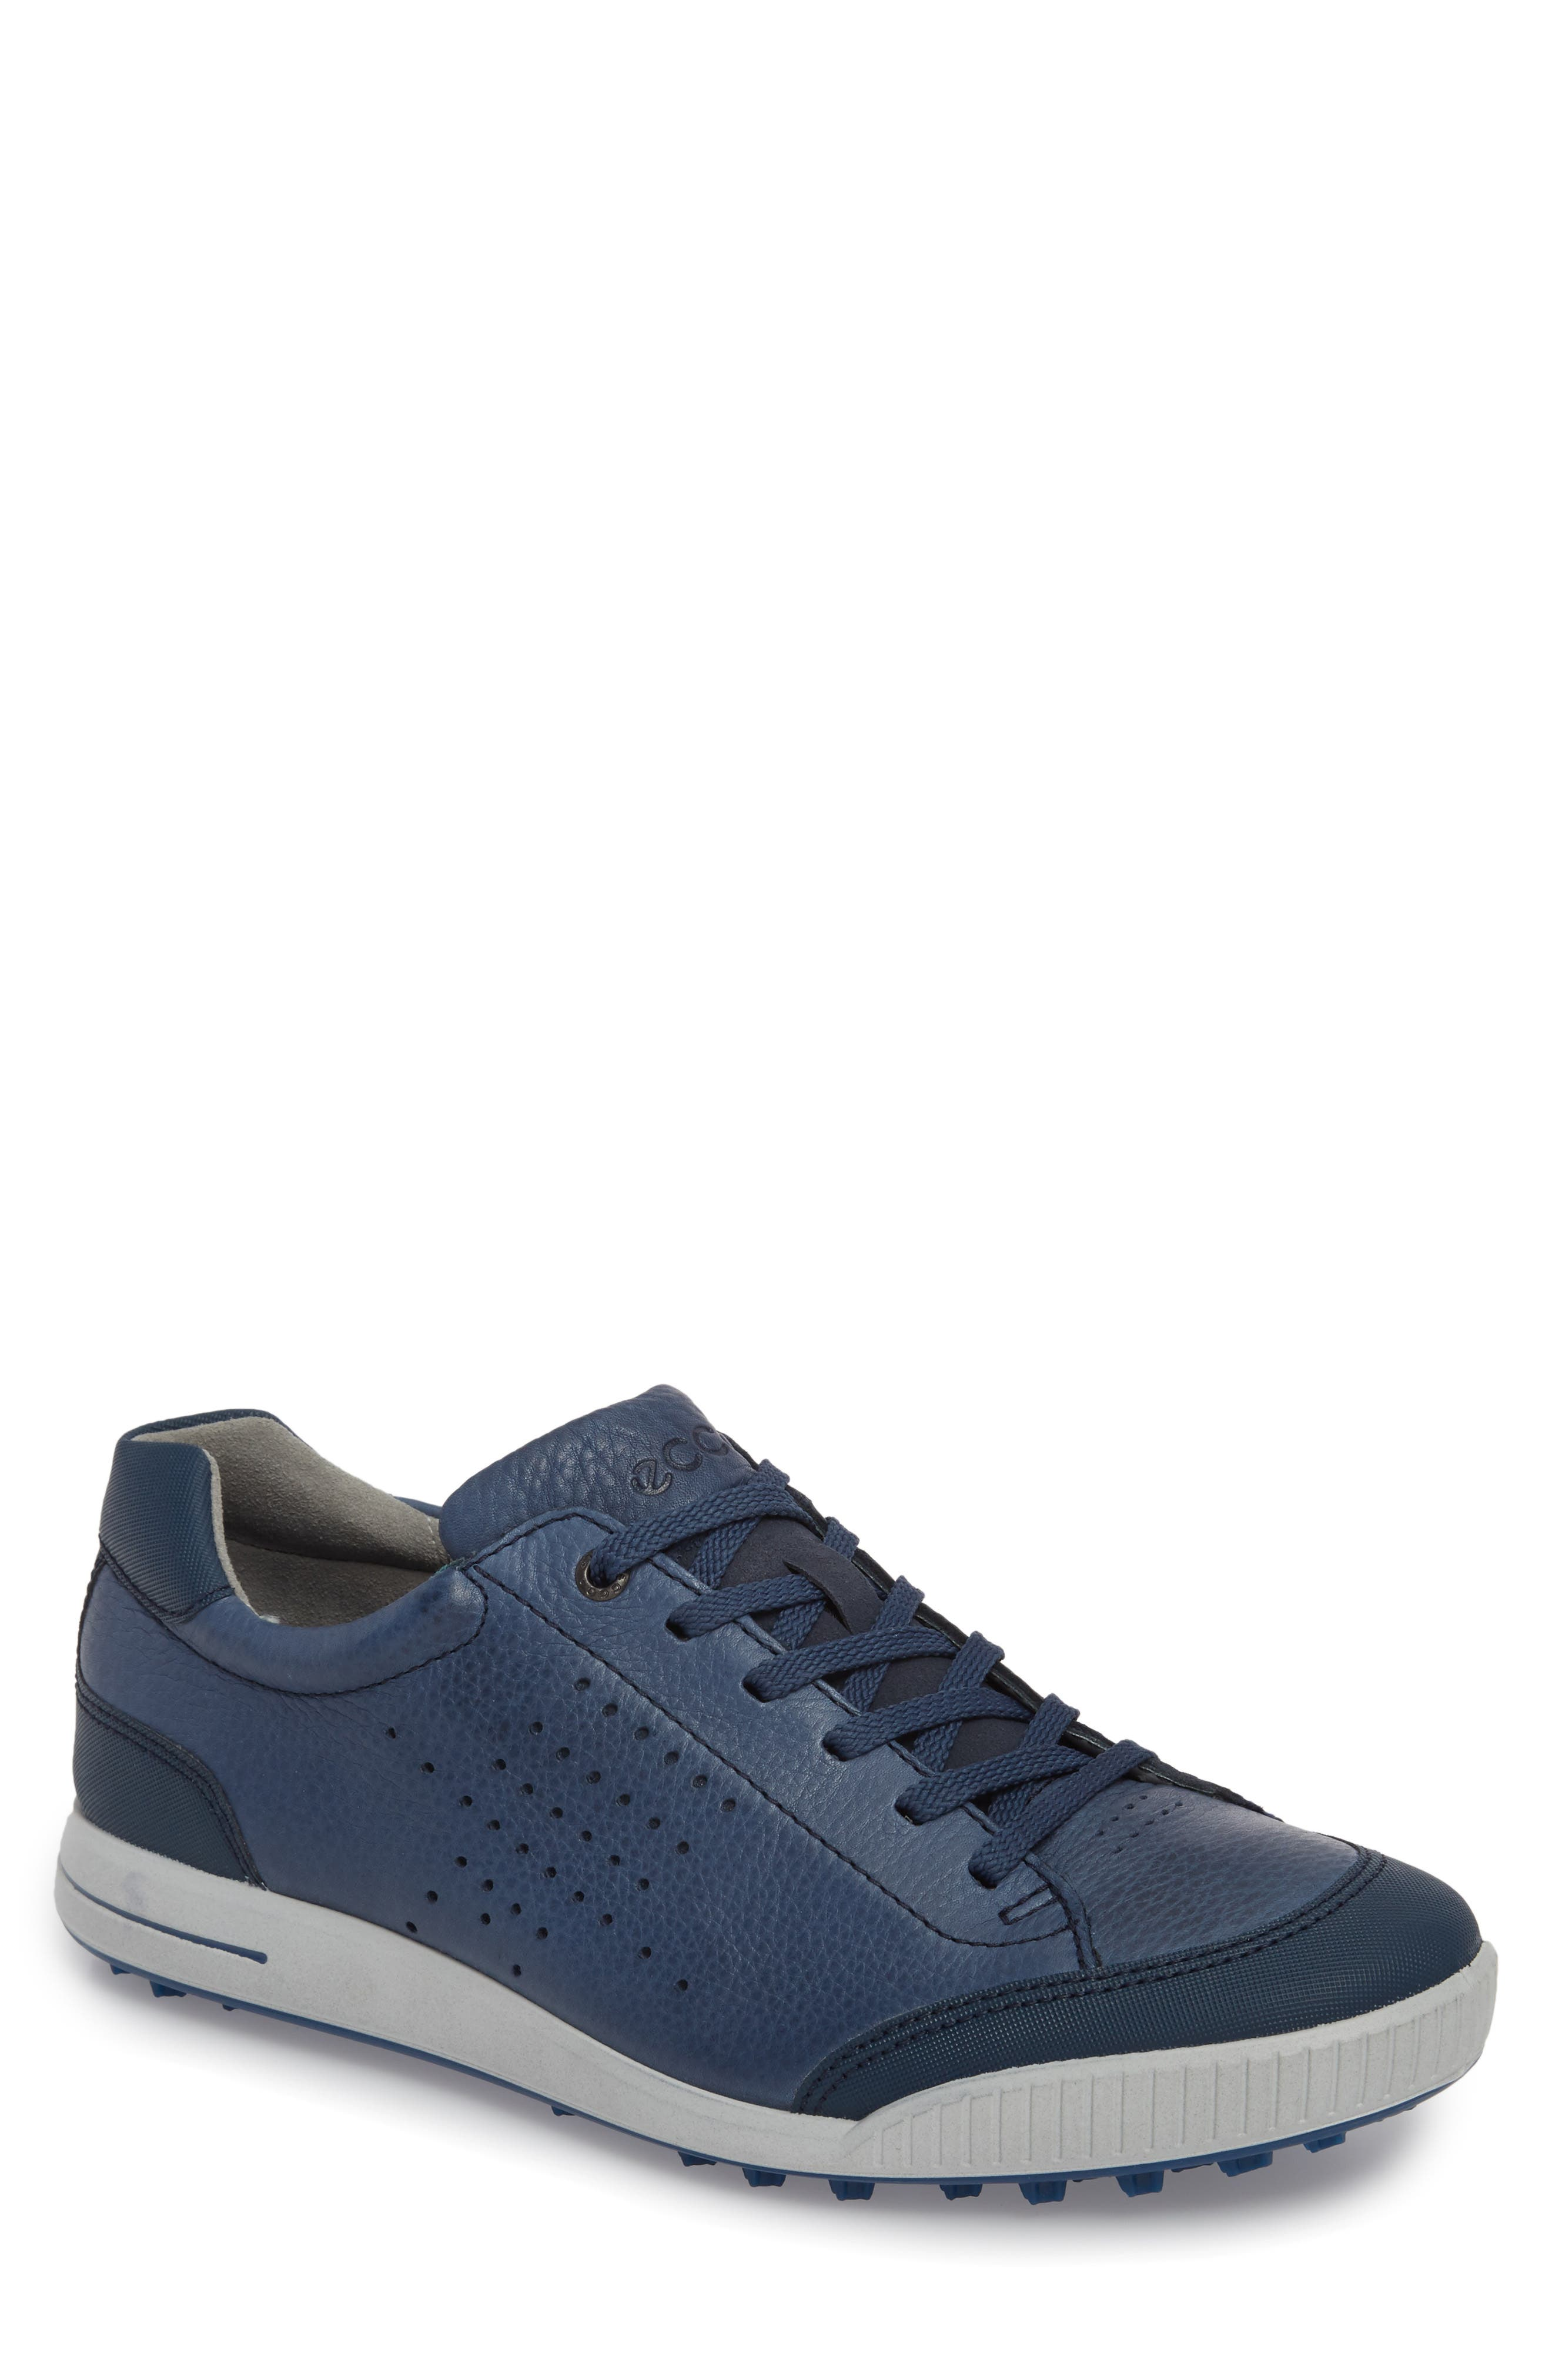 Main Image - ECCO Street Retro HM Golf Shoe (Men)